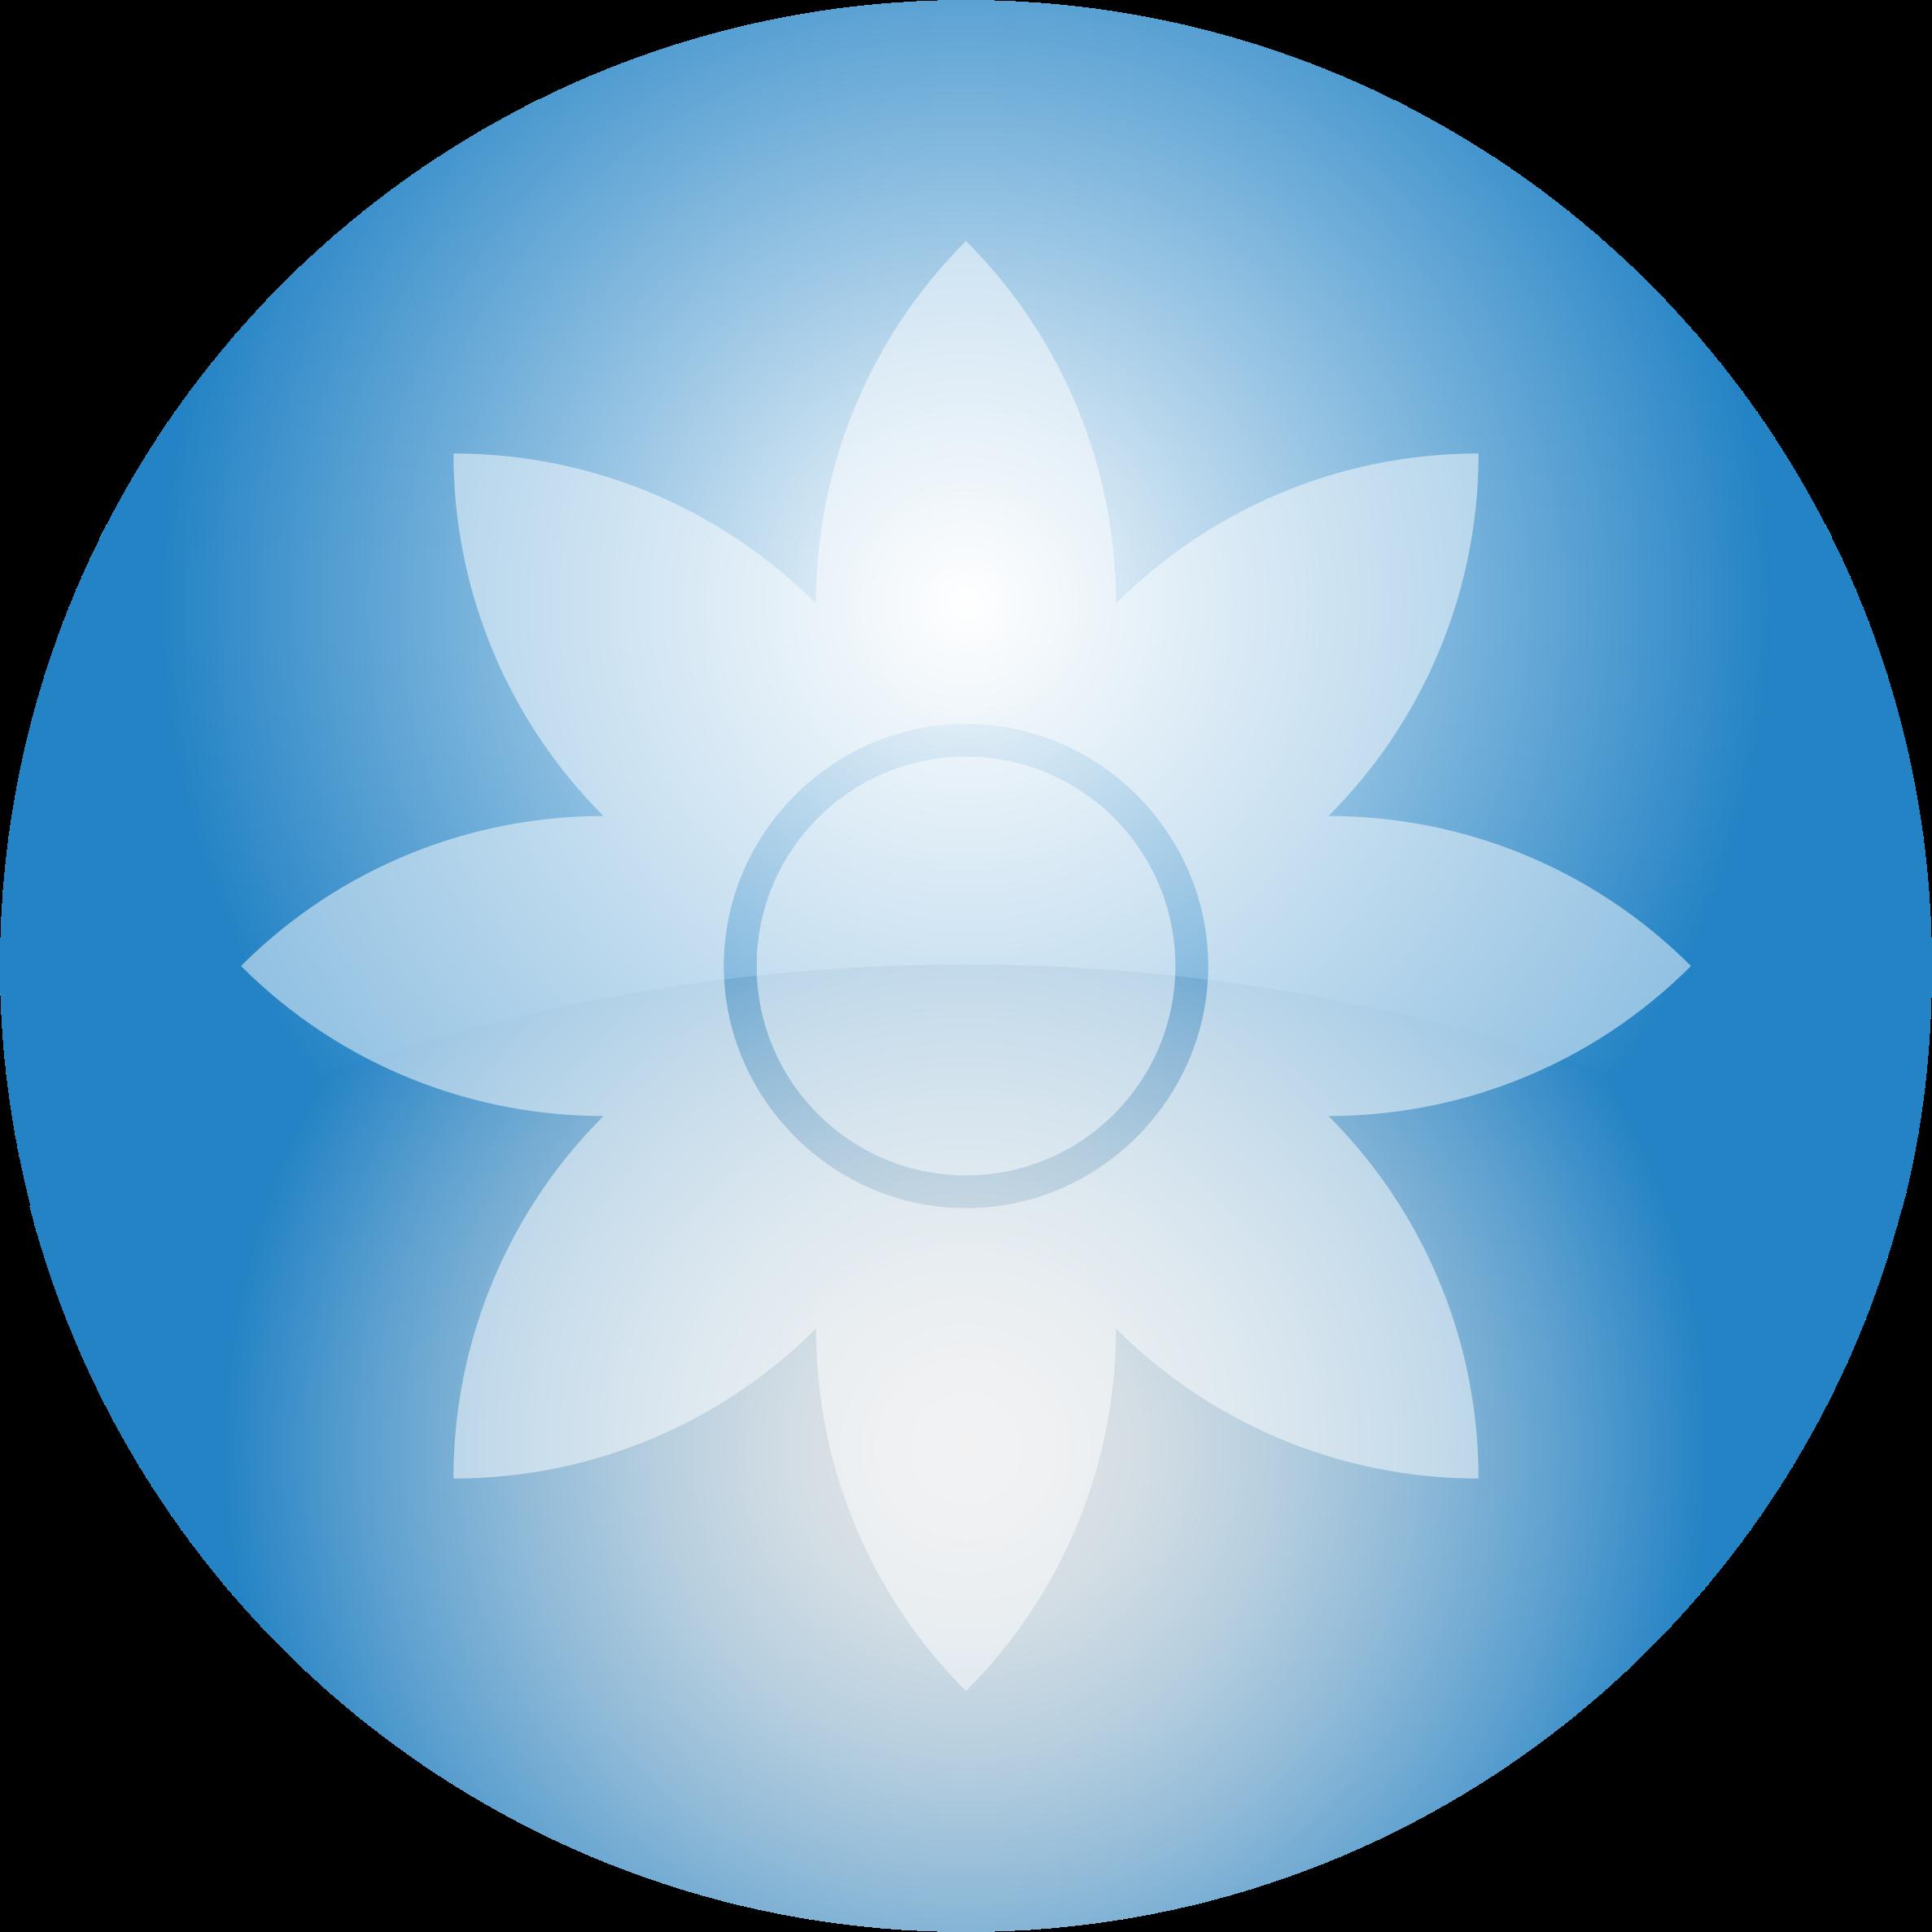 Flower orb big image. Circle clipart sky blue